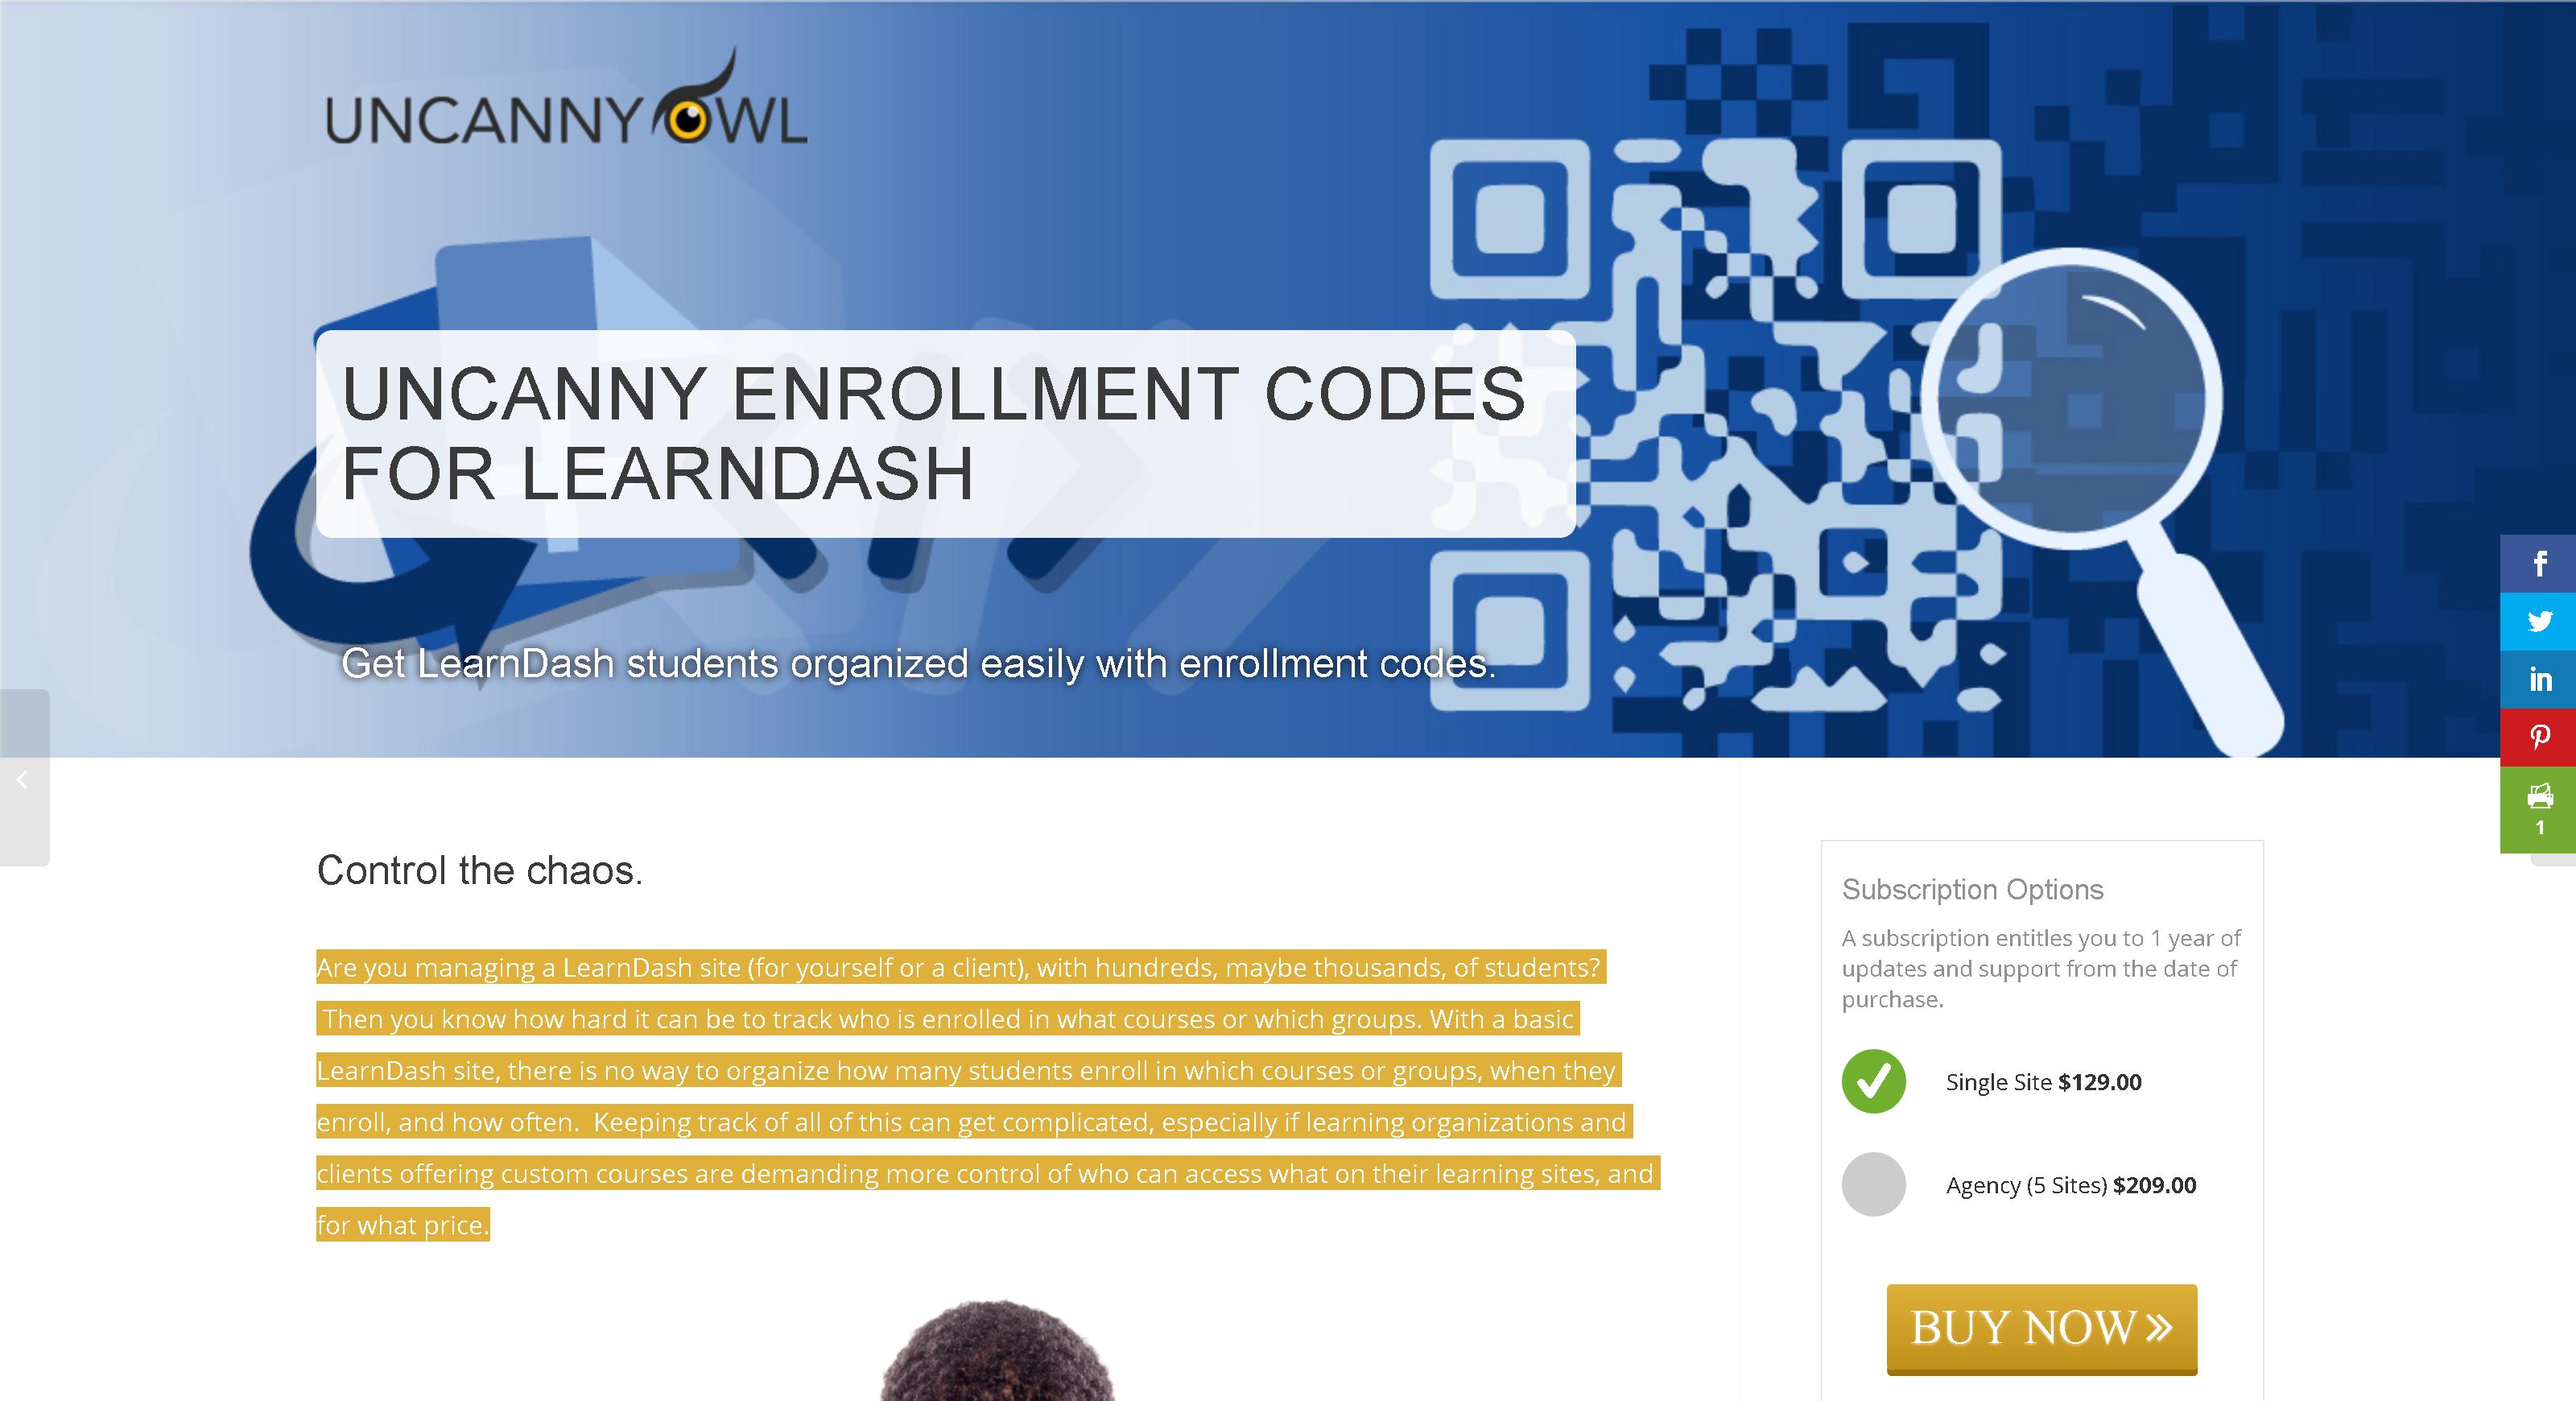 Uncanny LearnDash Enrollment Codes 3.2.0 – Get students organized easily with enrollment codes